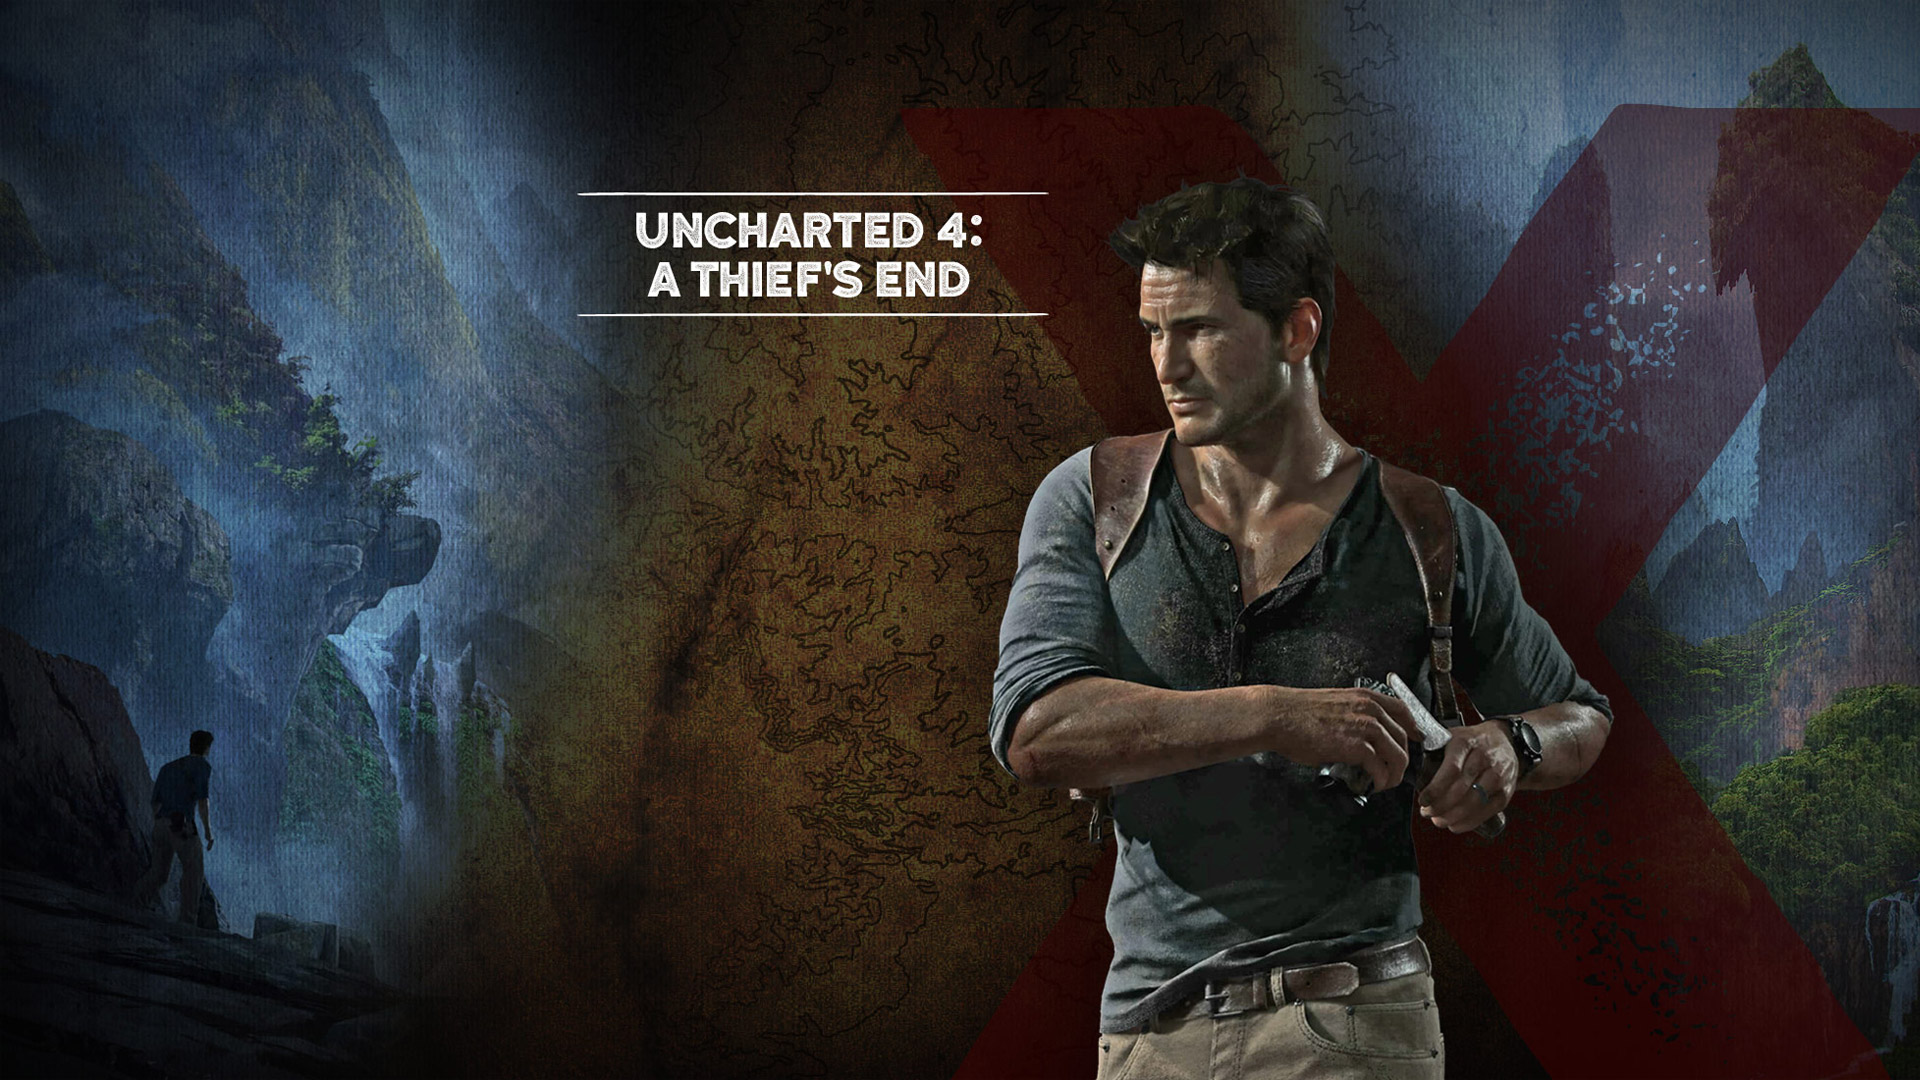 Uncharted 4 A Thiefs End Wallpapers HD   InspirationSeekcom 1920x1080